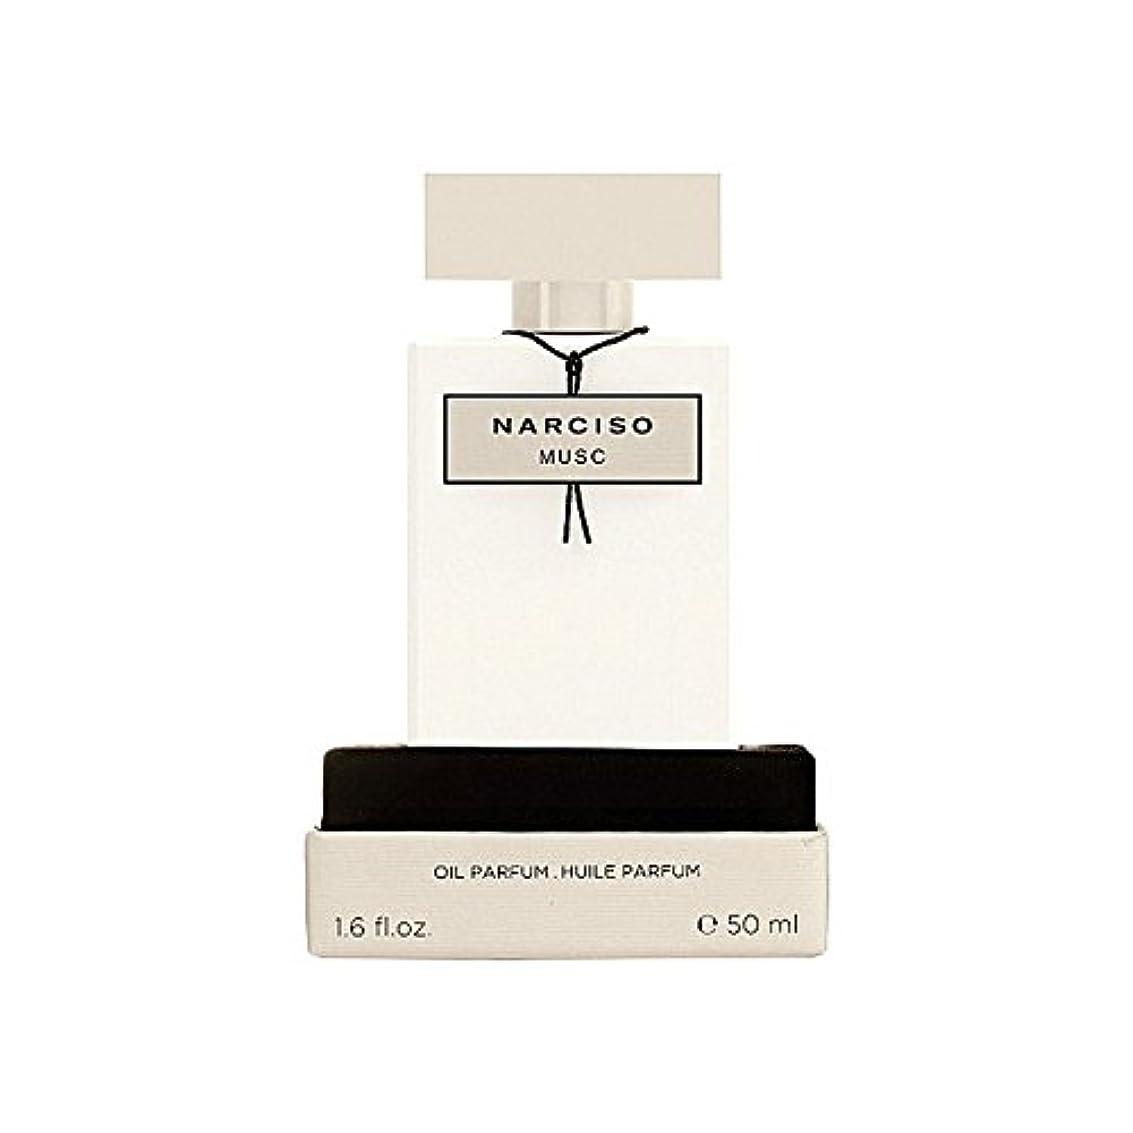 Narciso Rodriguez Narciso Musc Oil 50ml - ナルシソ?ロドリゲスナルシソオイル50ミリリットル [並行輸入品]